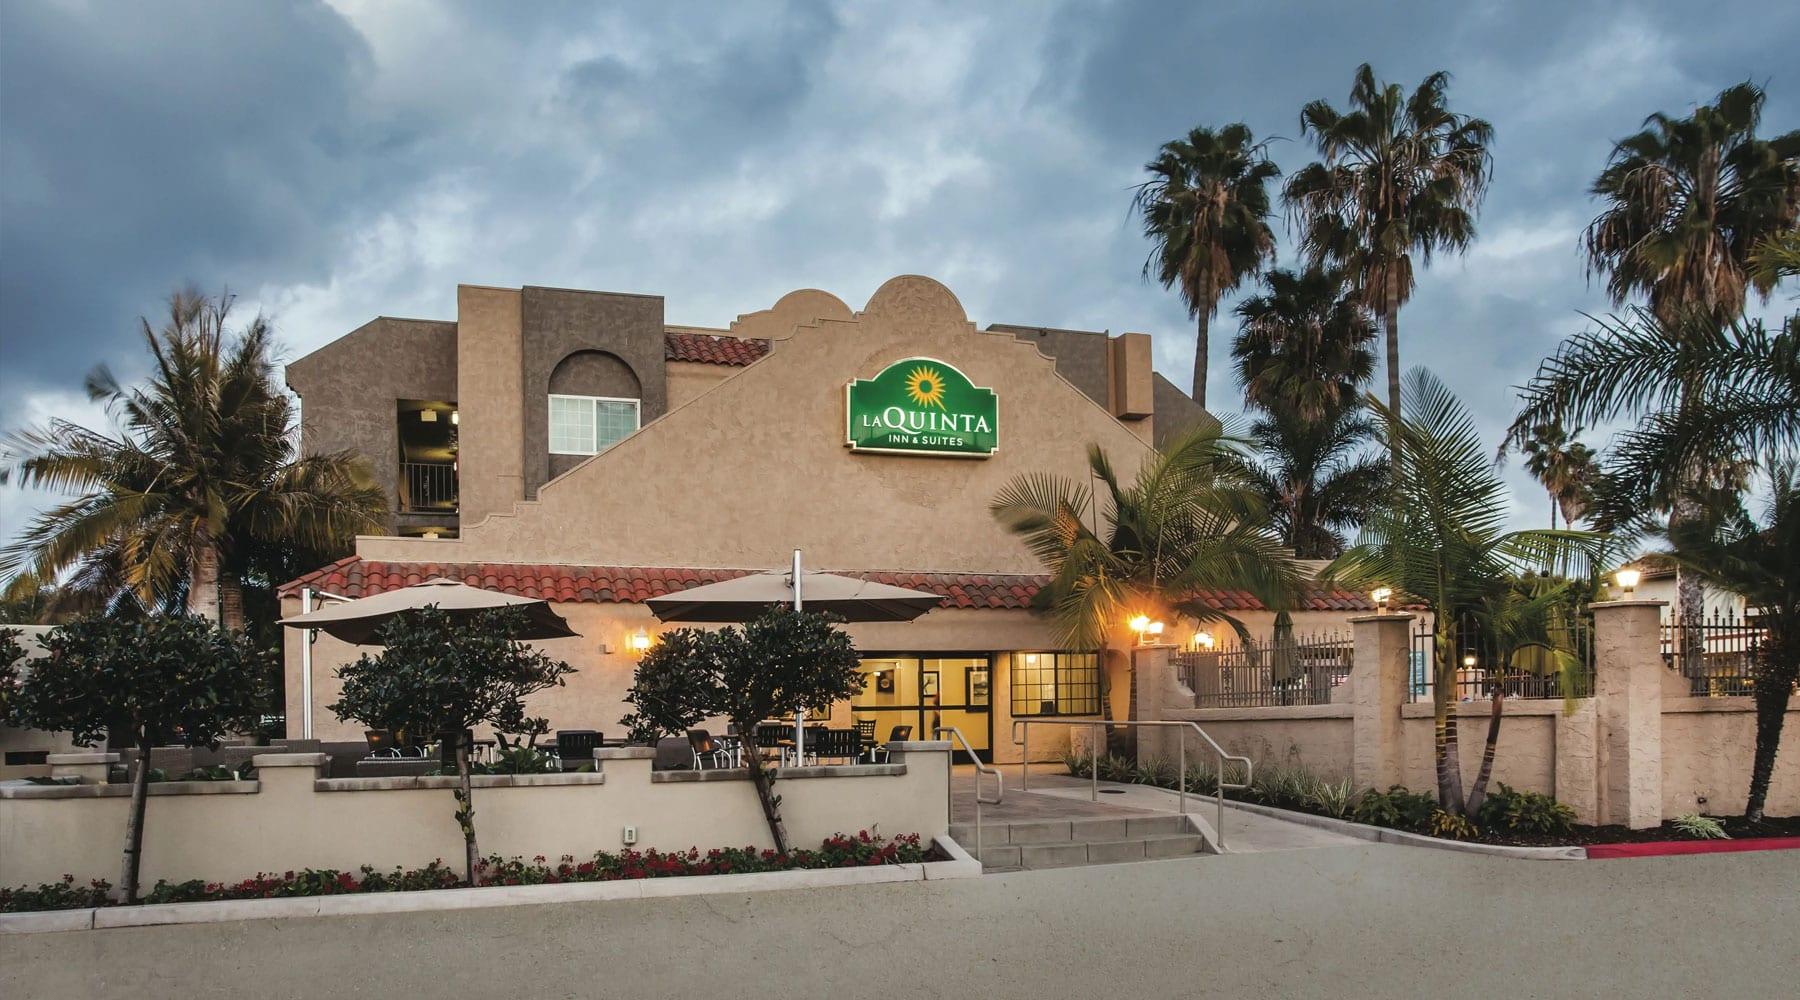 La Quinta Inn & Suites Carlsbad – Legoland Area